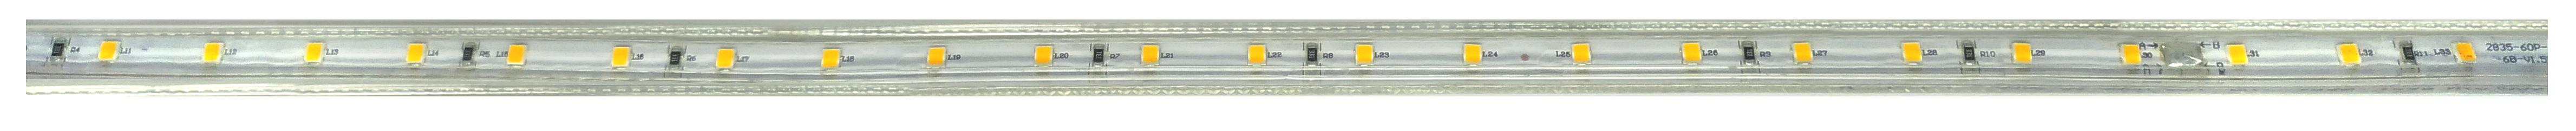 ML-0041, ML-0042.png